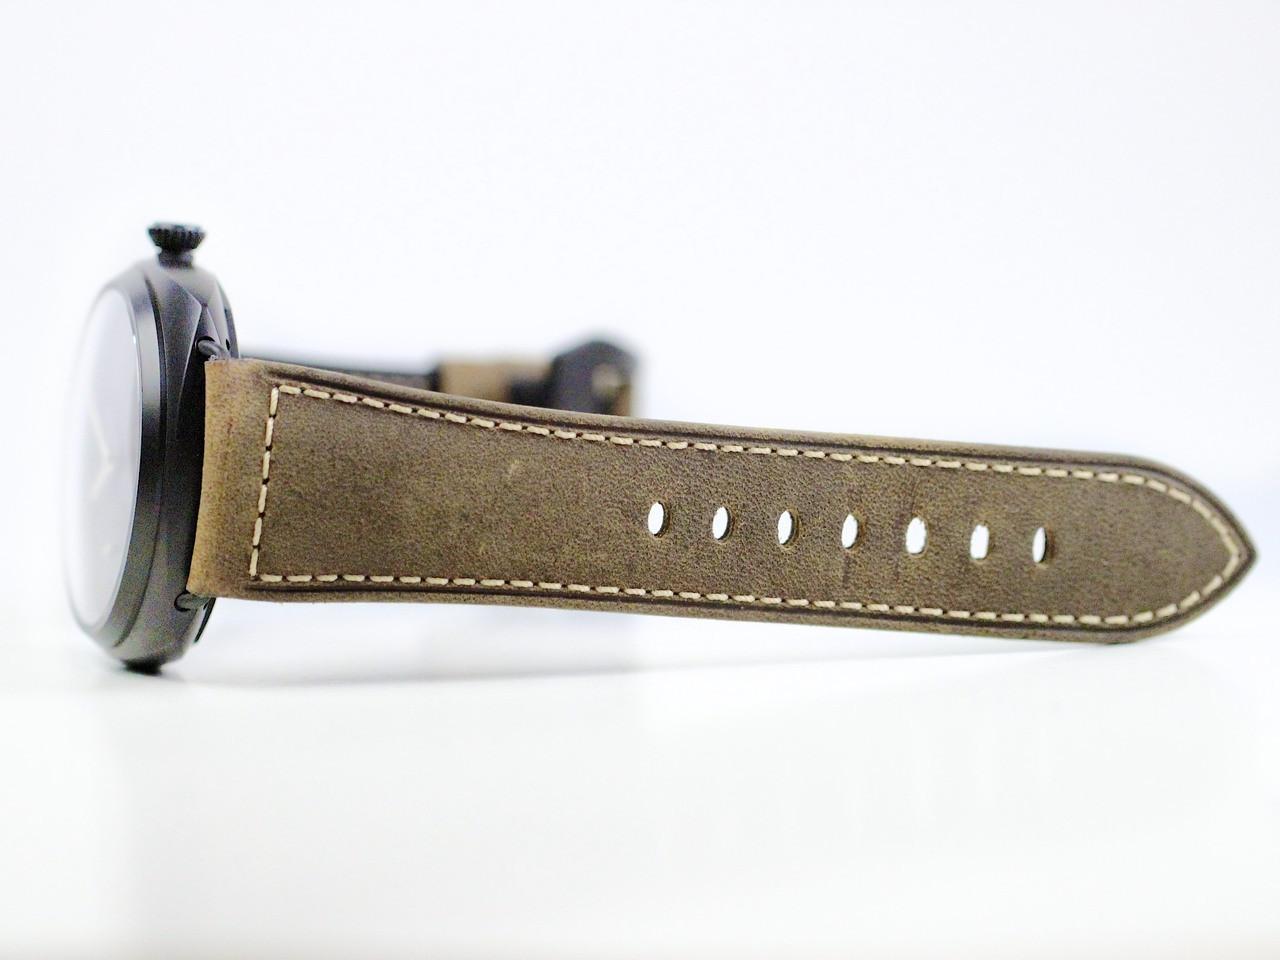 Leather Strap - New Panerai Watch - Radiomir Composite 3 Days PAM 504 www.Legendoftime.com - Chicago Watch Center